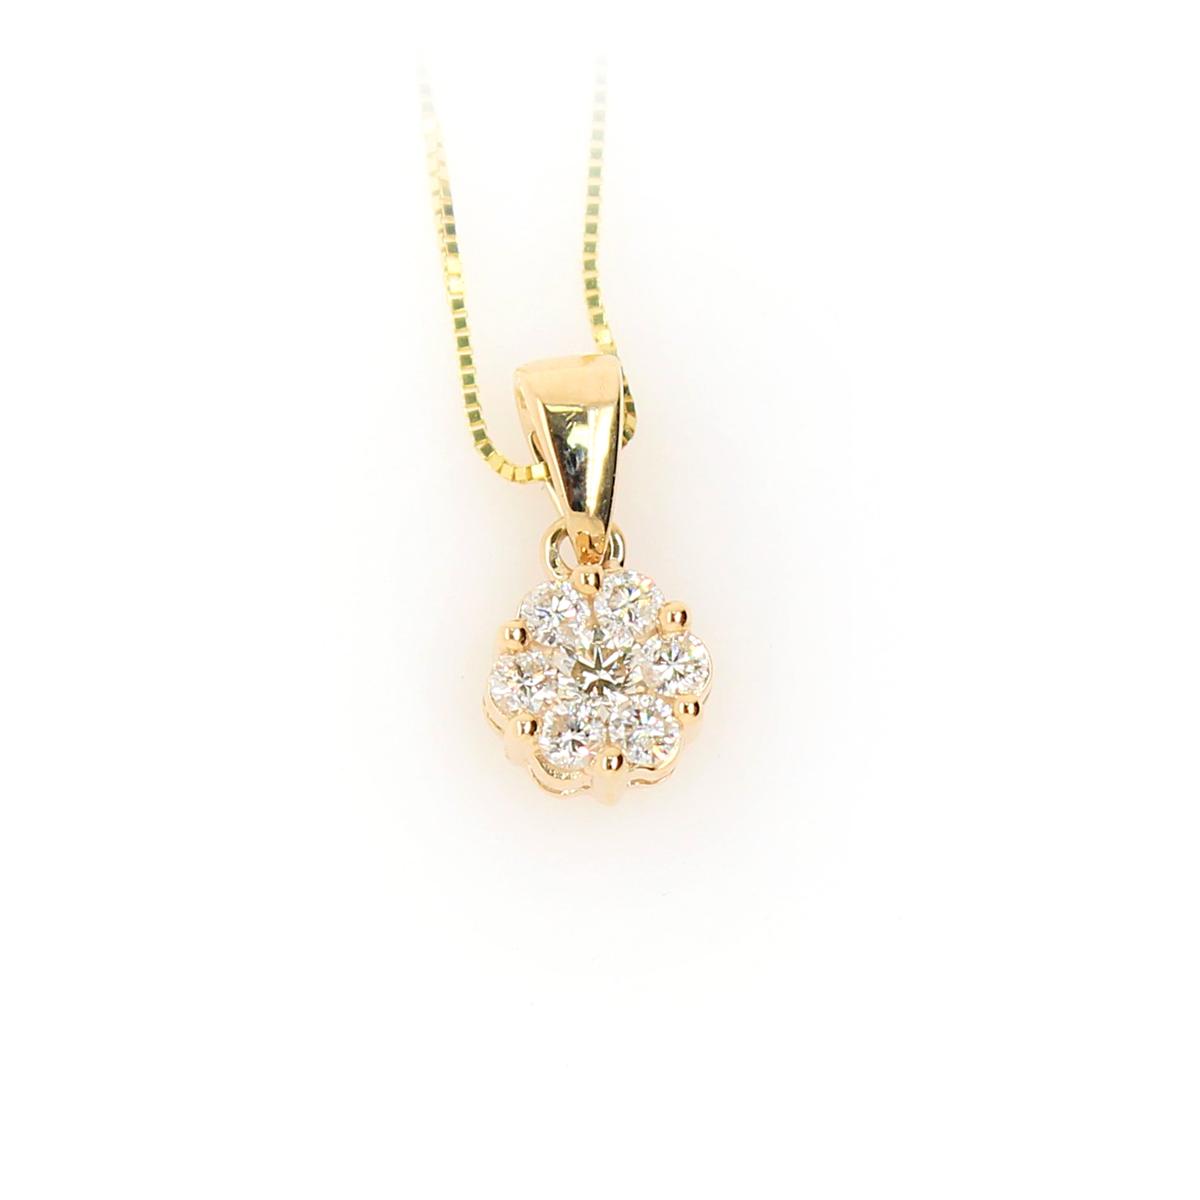 Shefi Diamonds 10 Karat Yellow Gold 2 Carat Cluster Diamond Pendant Necklace